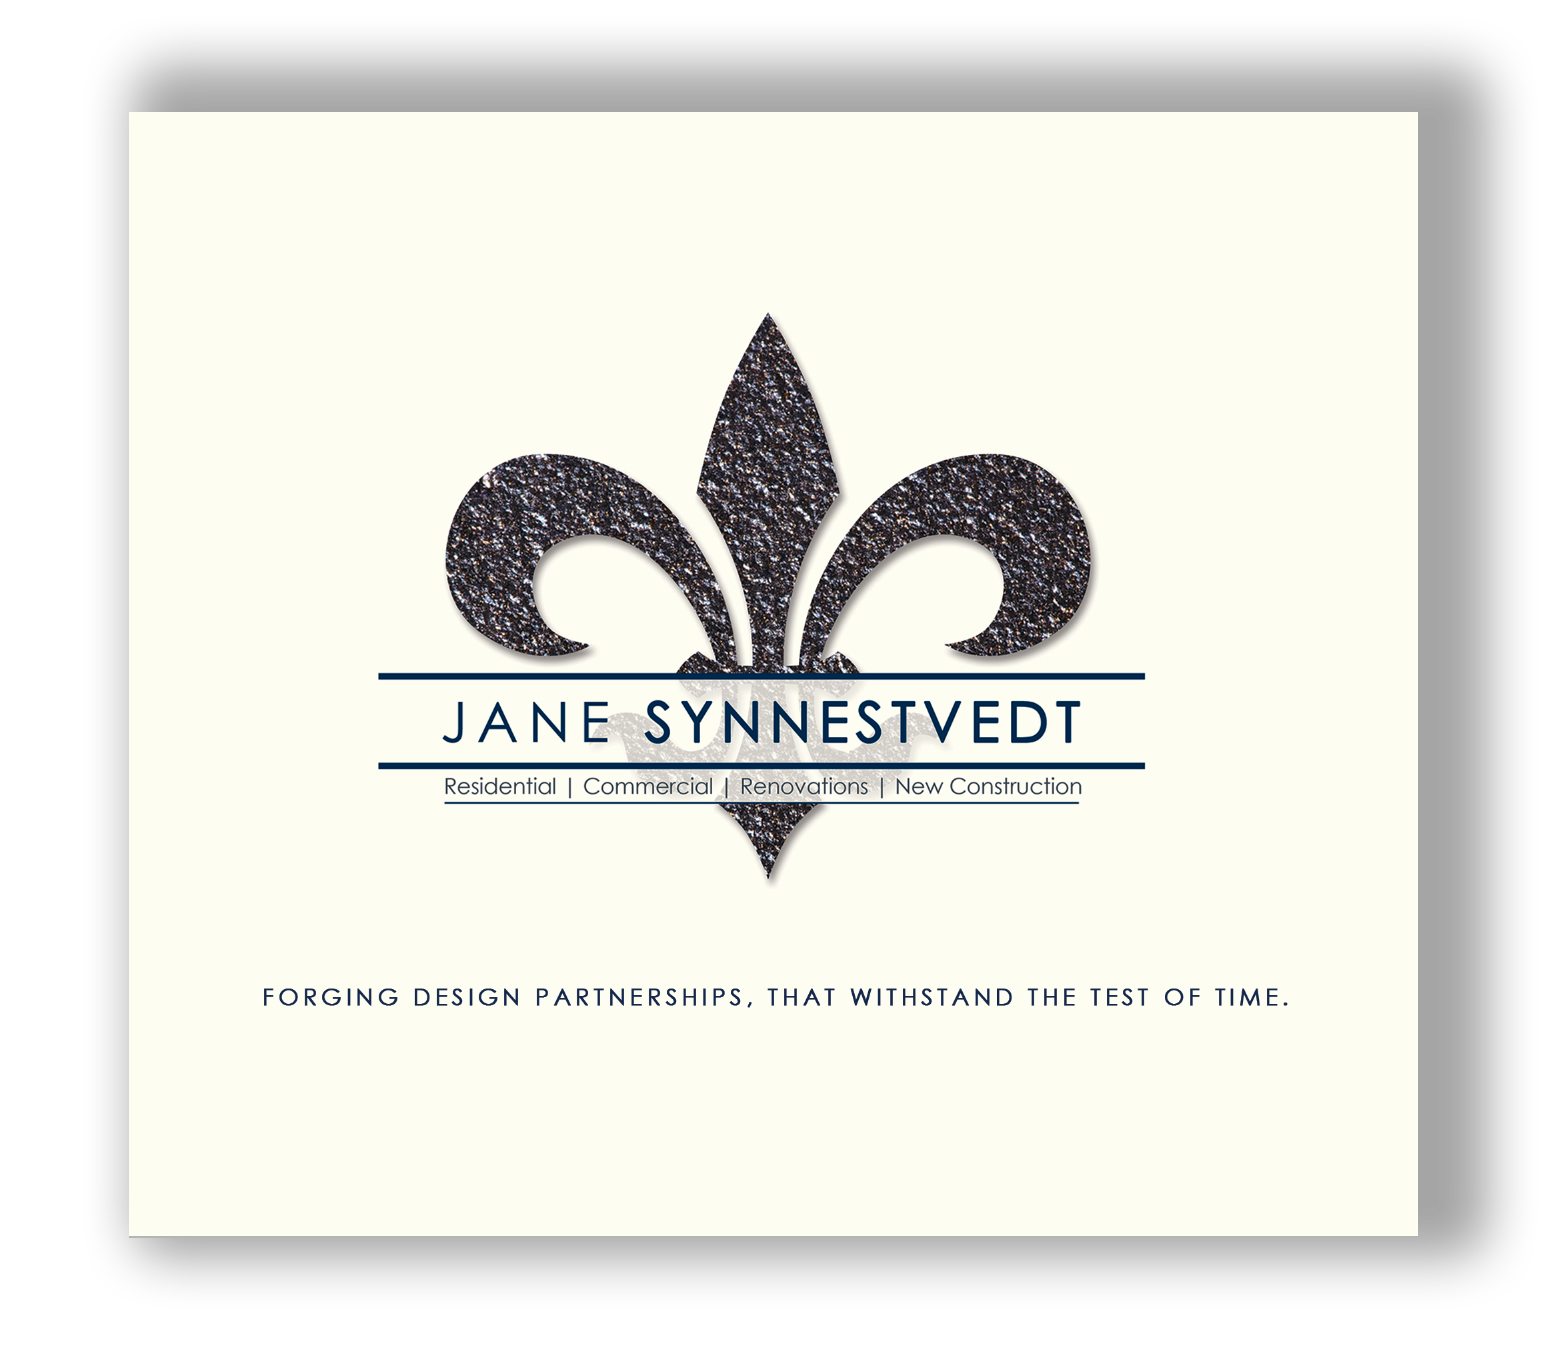 Jane Synnestvedt - New Logo V2.png